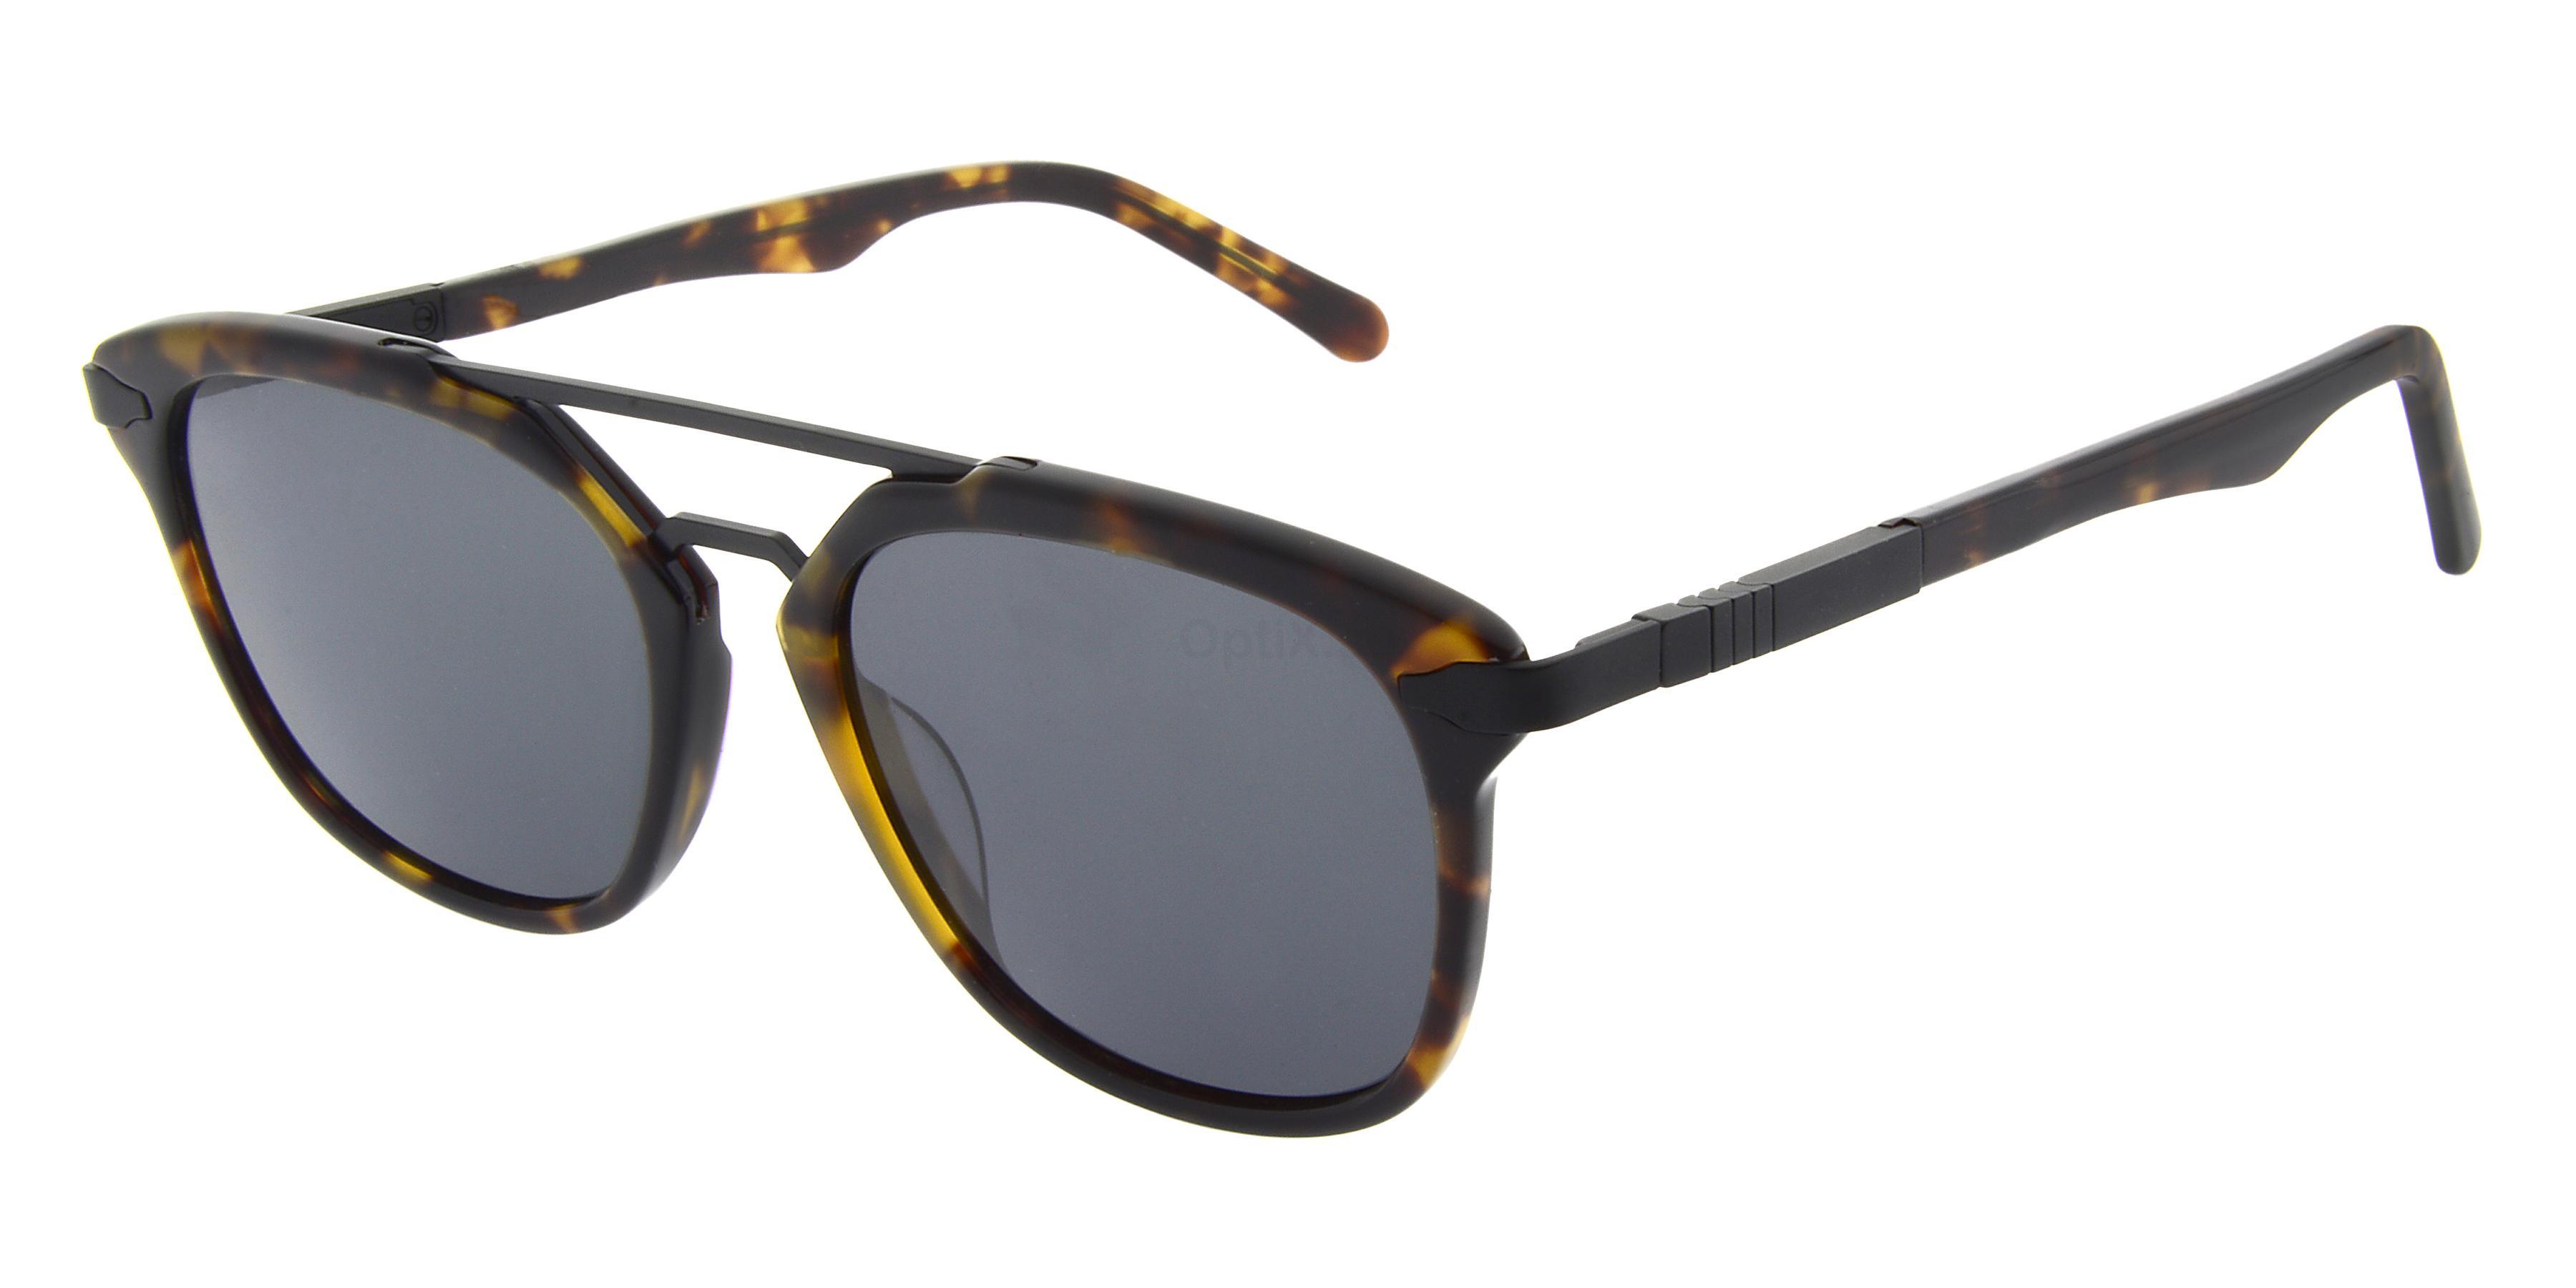 485 SP3403 Sunglasses, Spine